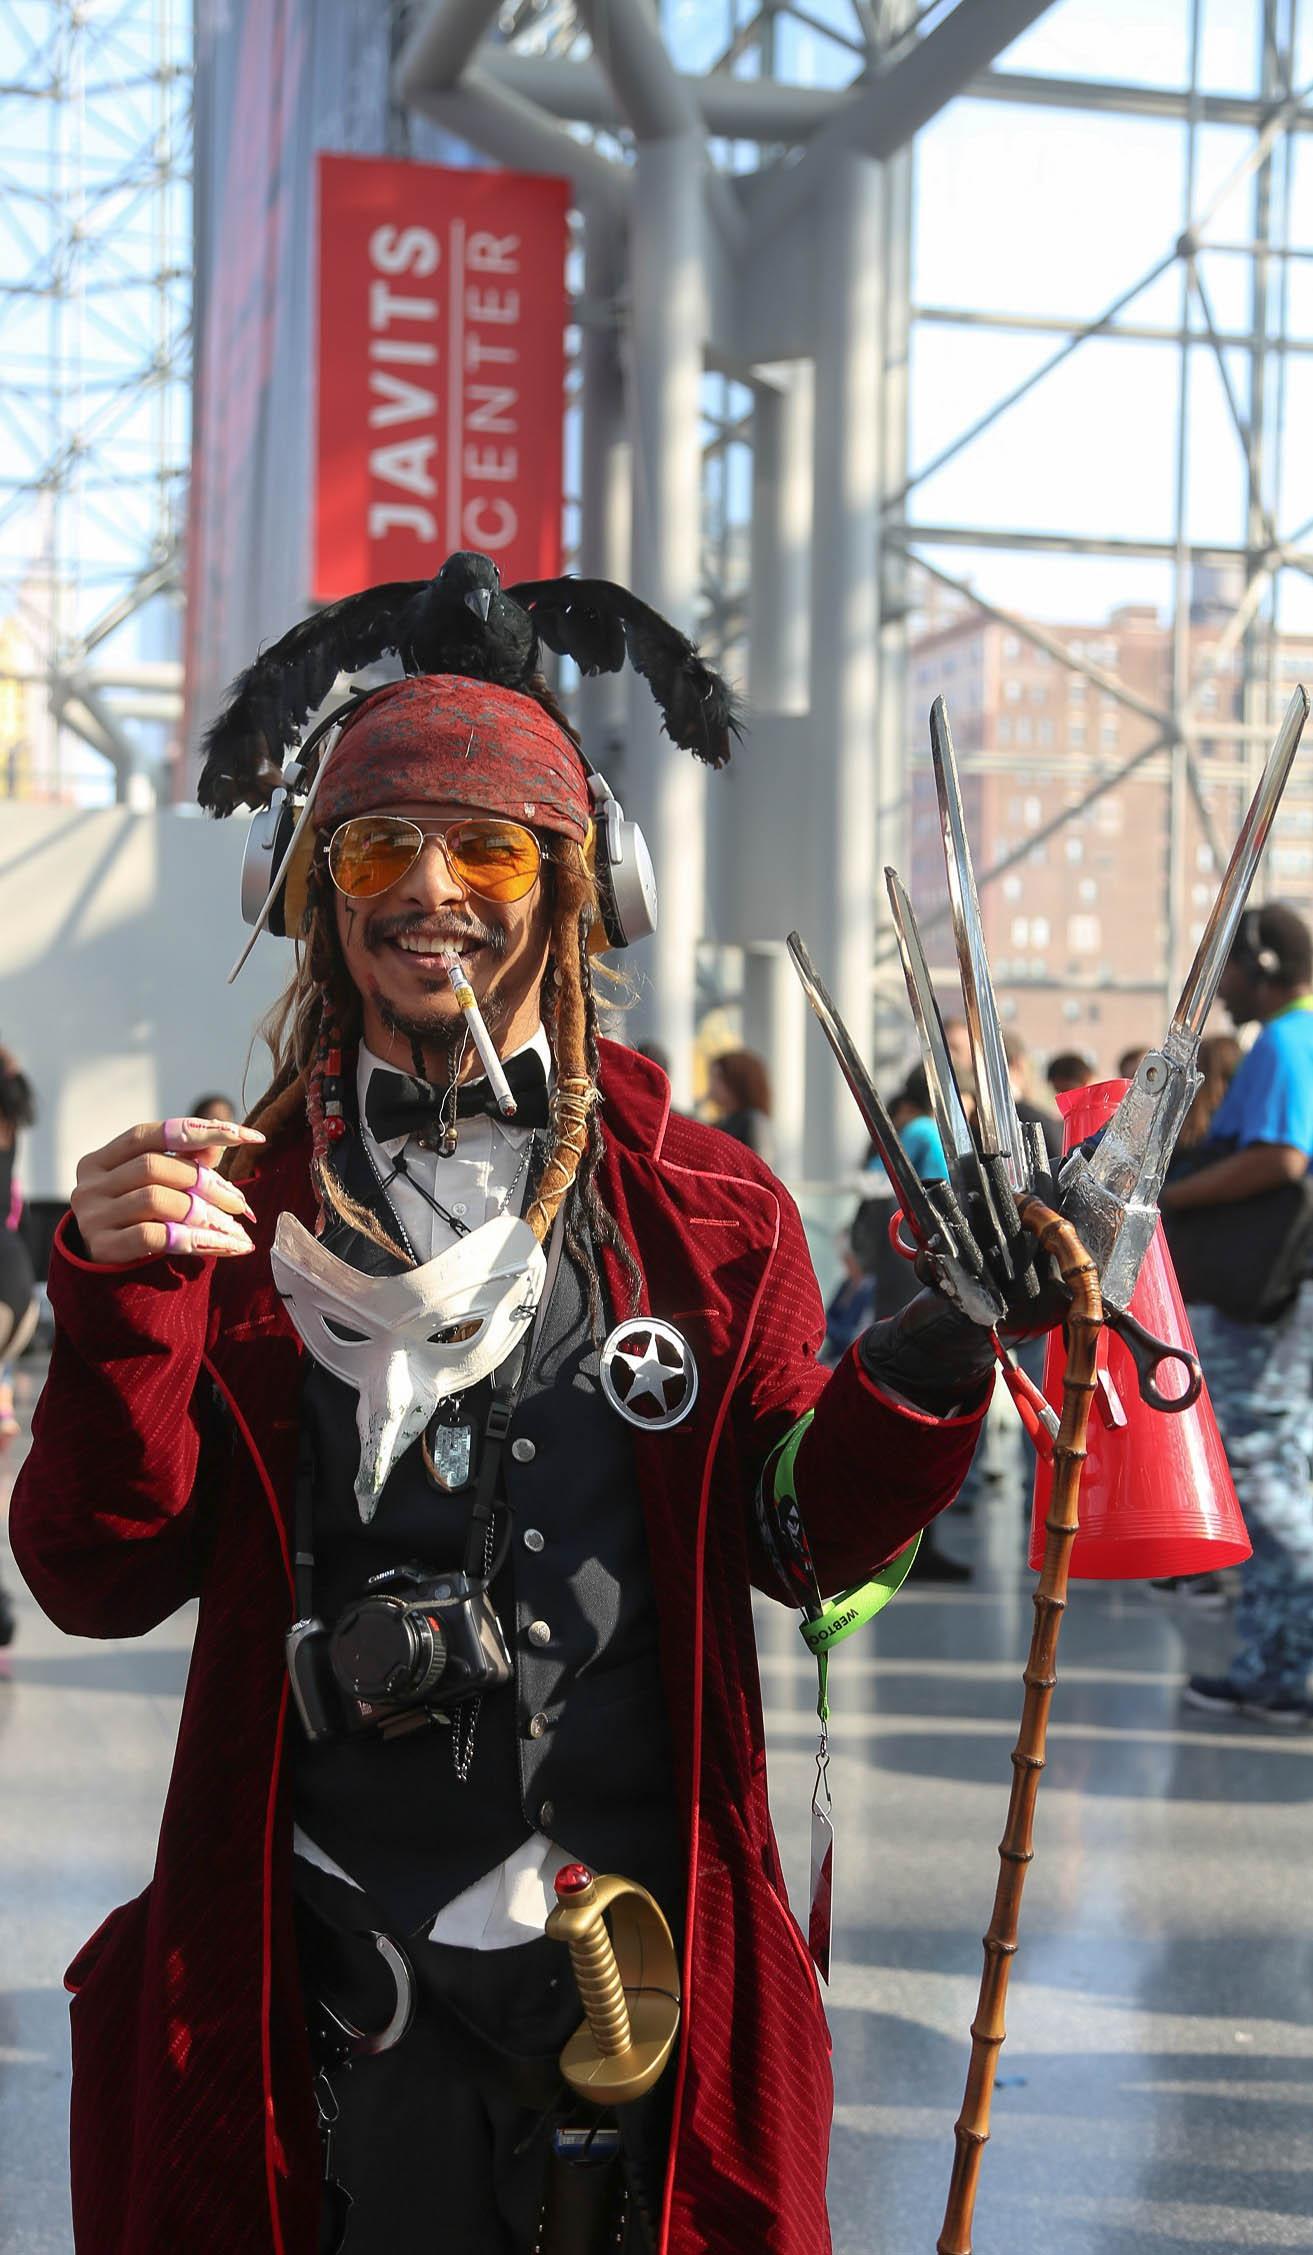 Filenew York Comic Con 2015 Johnny Depp Characters 22020539176